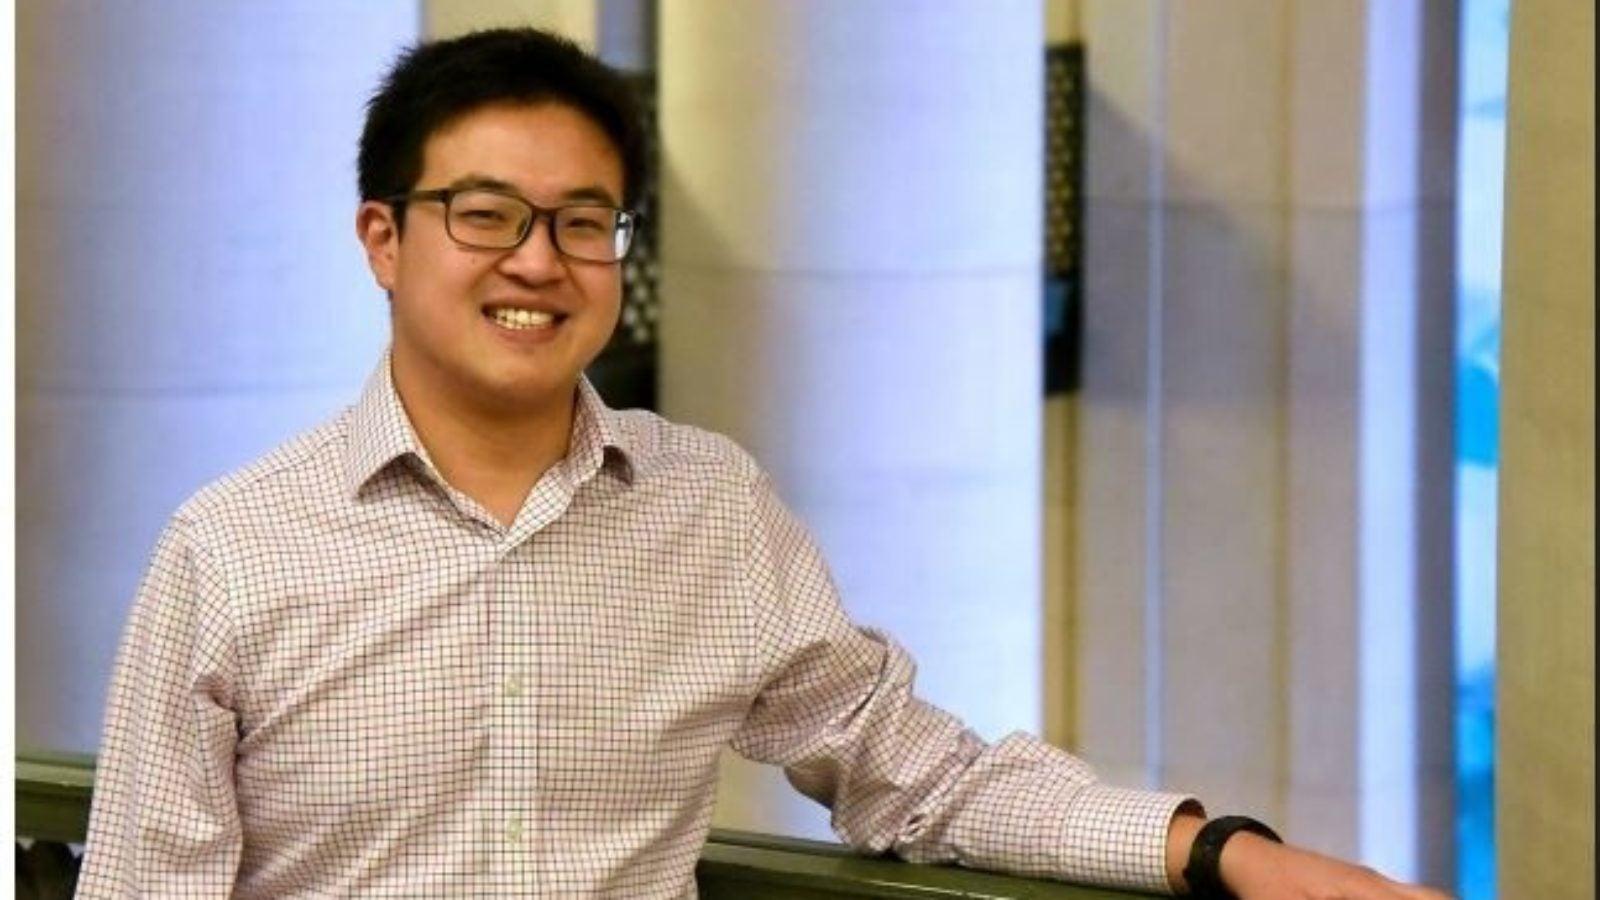 Timothy Loh MIT news